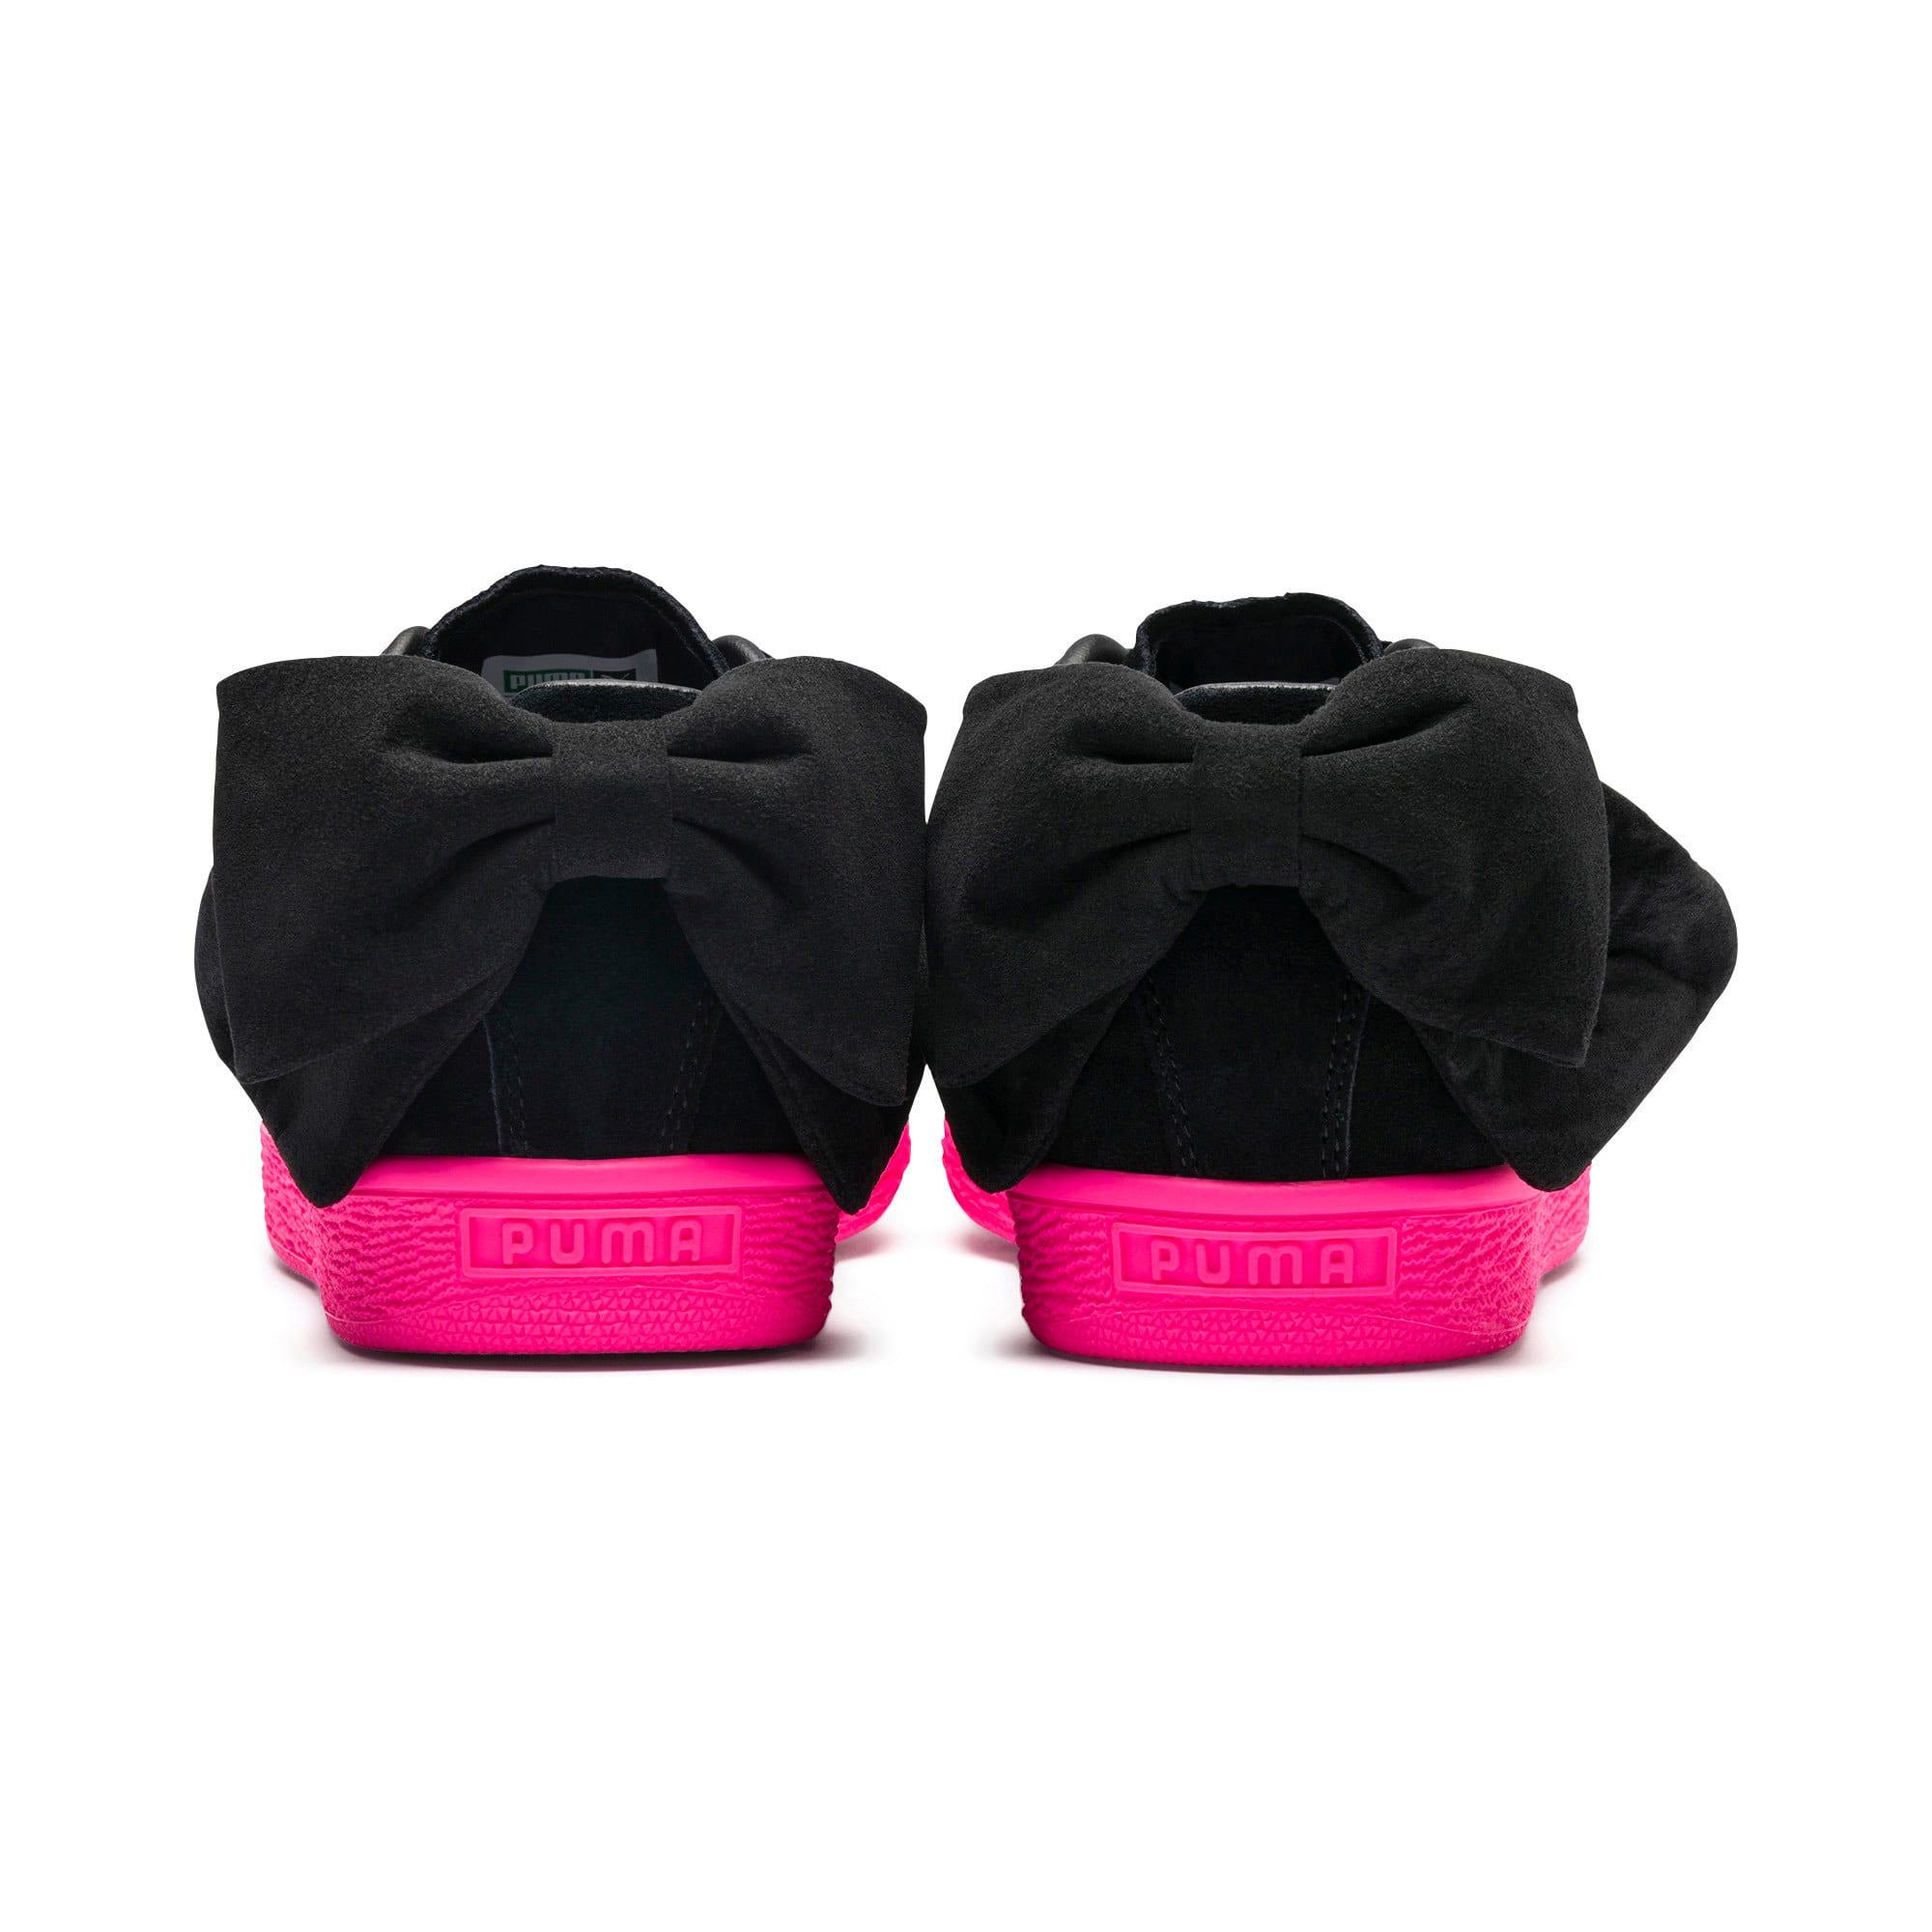 Thumbnail 4 of Suede Bow Block Women's Sneakers, Puma Black-Puma Black, medium